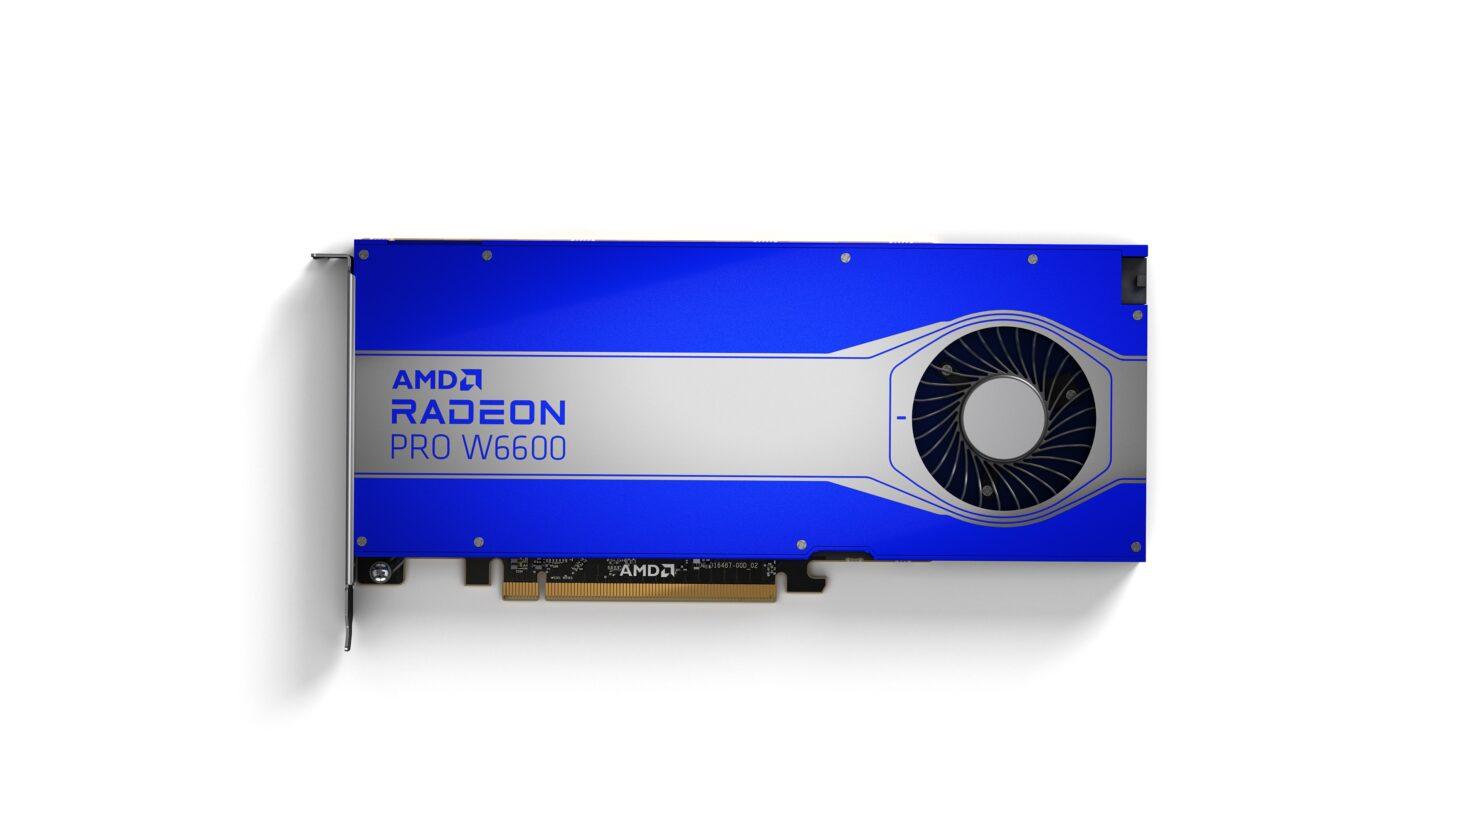 amd-radeon-pro-w6600-graphics-card-_2